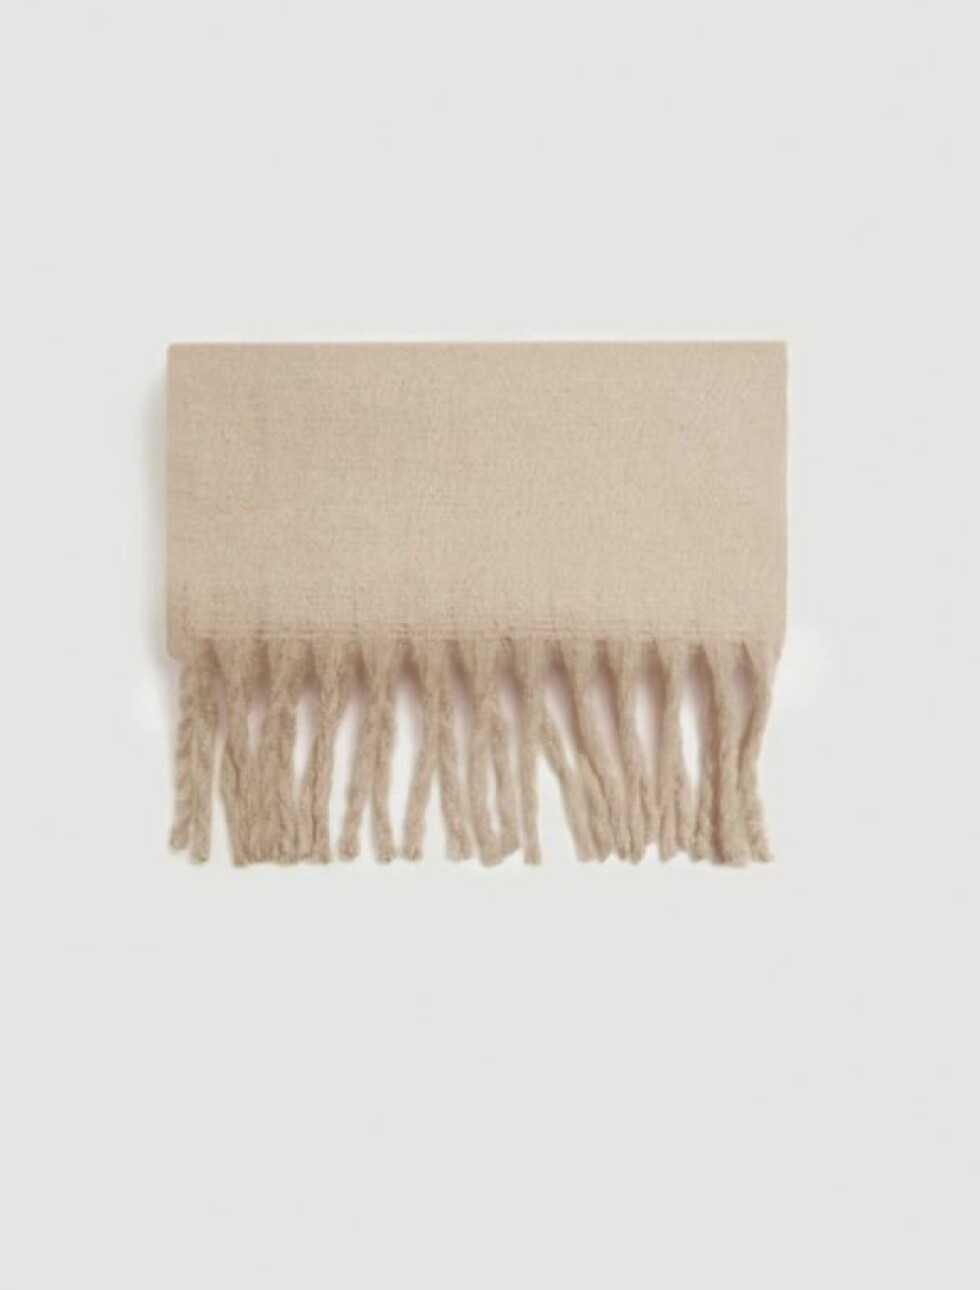 Skjerf fra Mango |299,-| https://shop.mango.com/no-en/women/scarves-and-foulards/textured-maxi-scarf_33013765.html?c=08&n=1&s=accesorios_she.accesorio;52,452